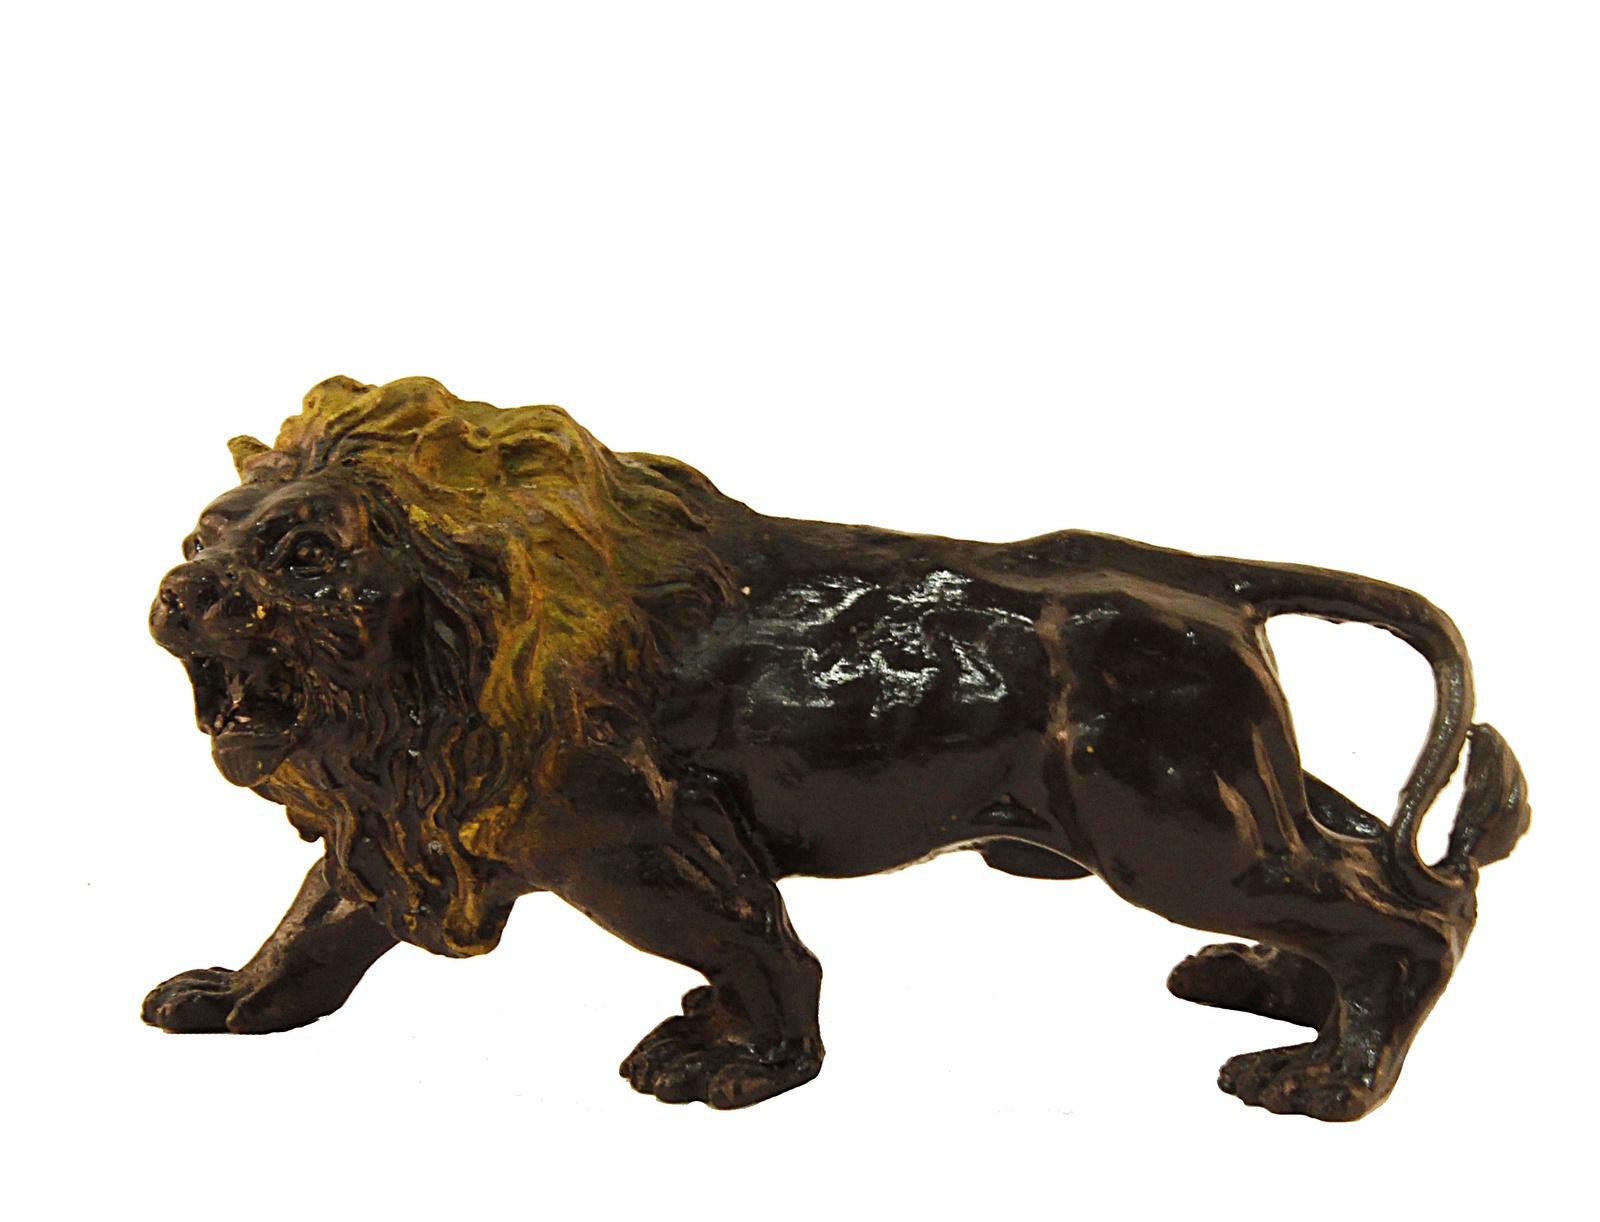 Статуэтка Антик Хобби OC36028, коричневый, золотой гиря iron head лев 16 0 кг